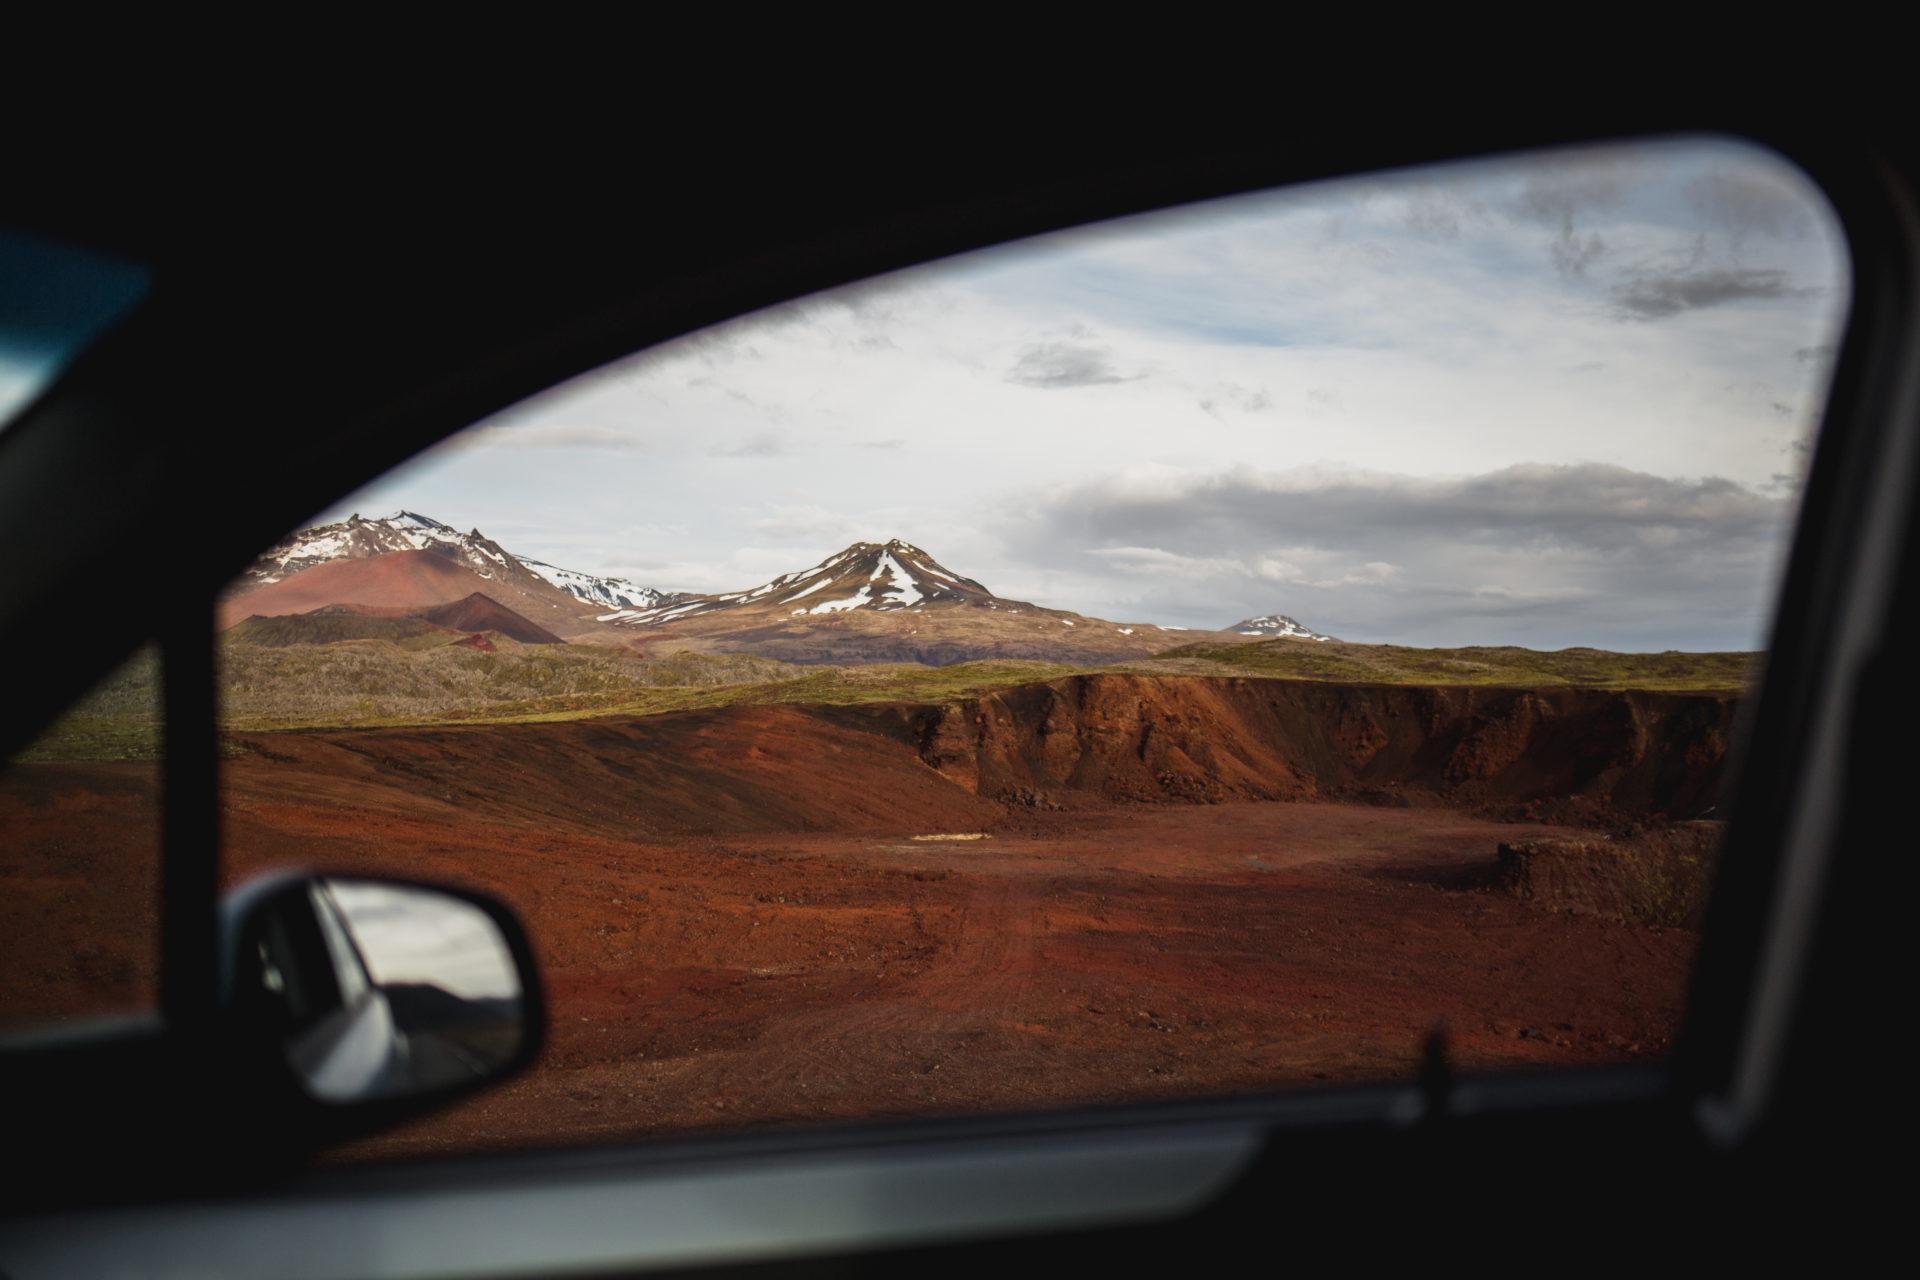 Island_Iceland_IMG_2824_Carolin-Weinkopf